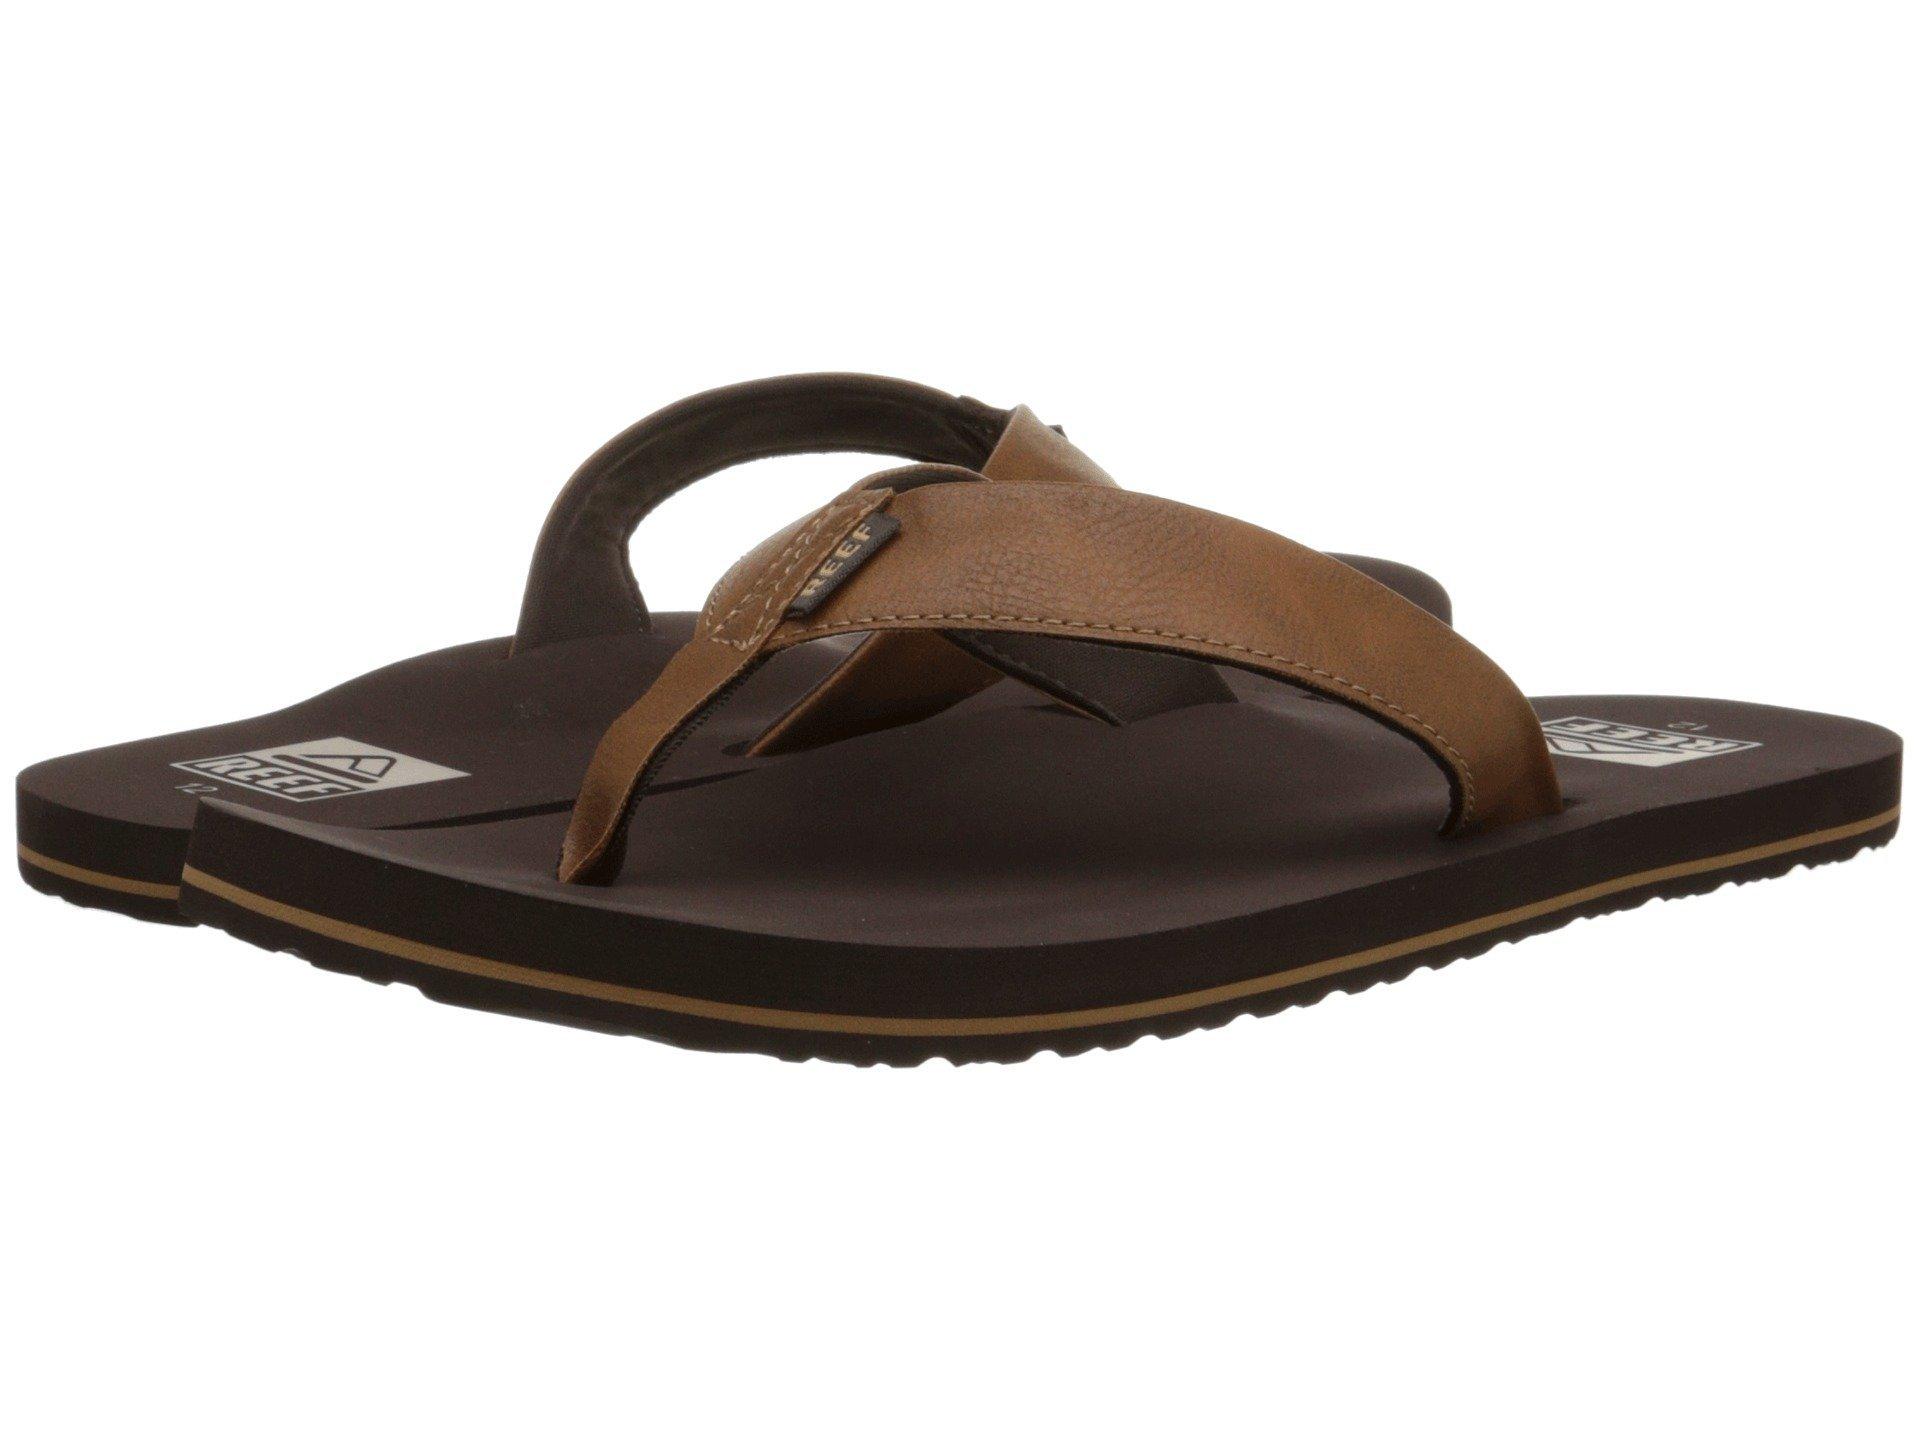 Reef Men's Twinpin Sandal, Brown, 10 M US